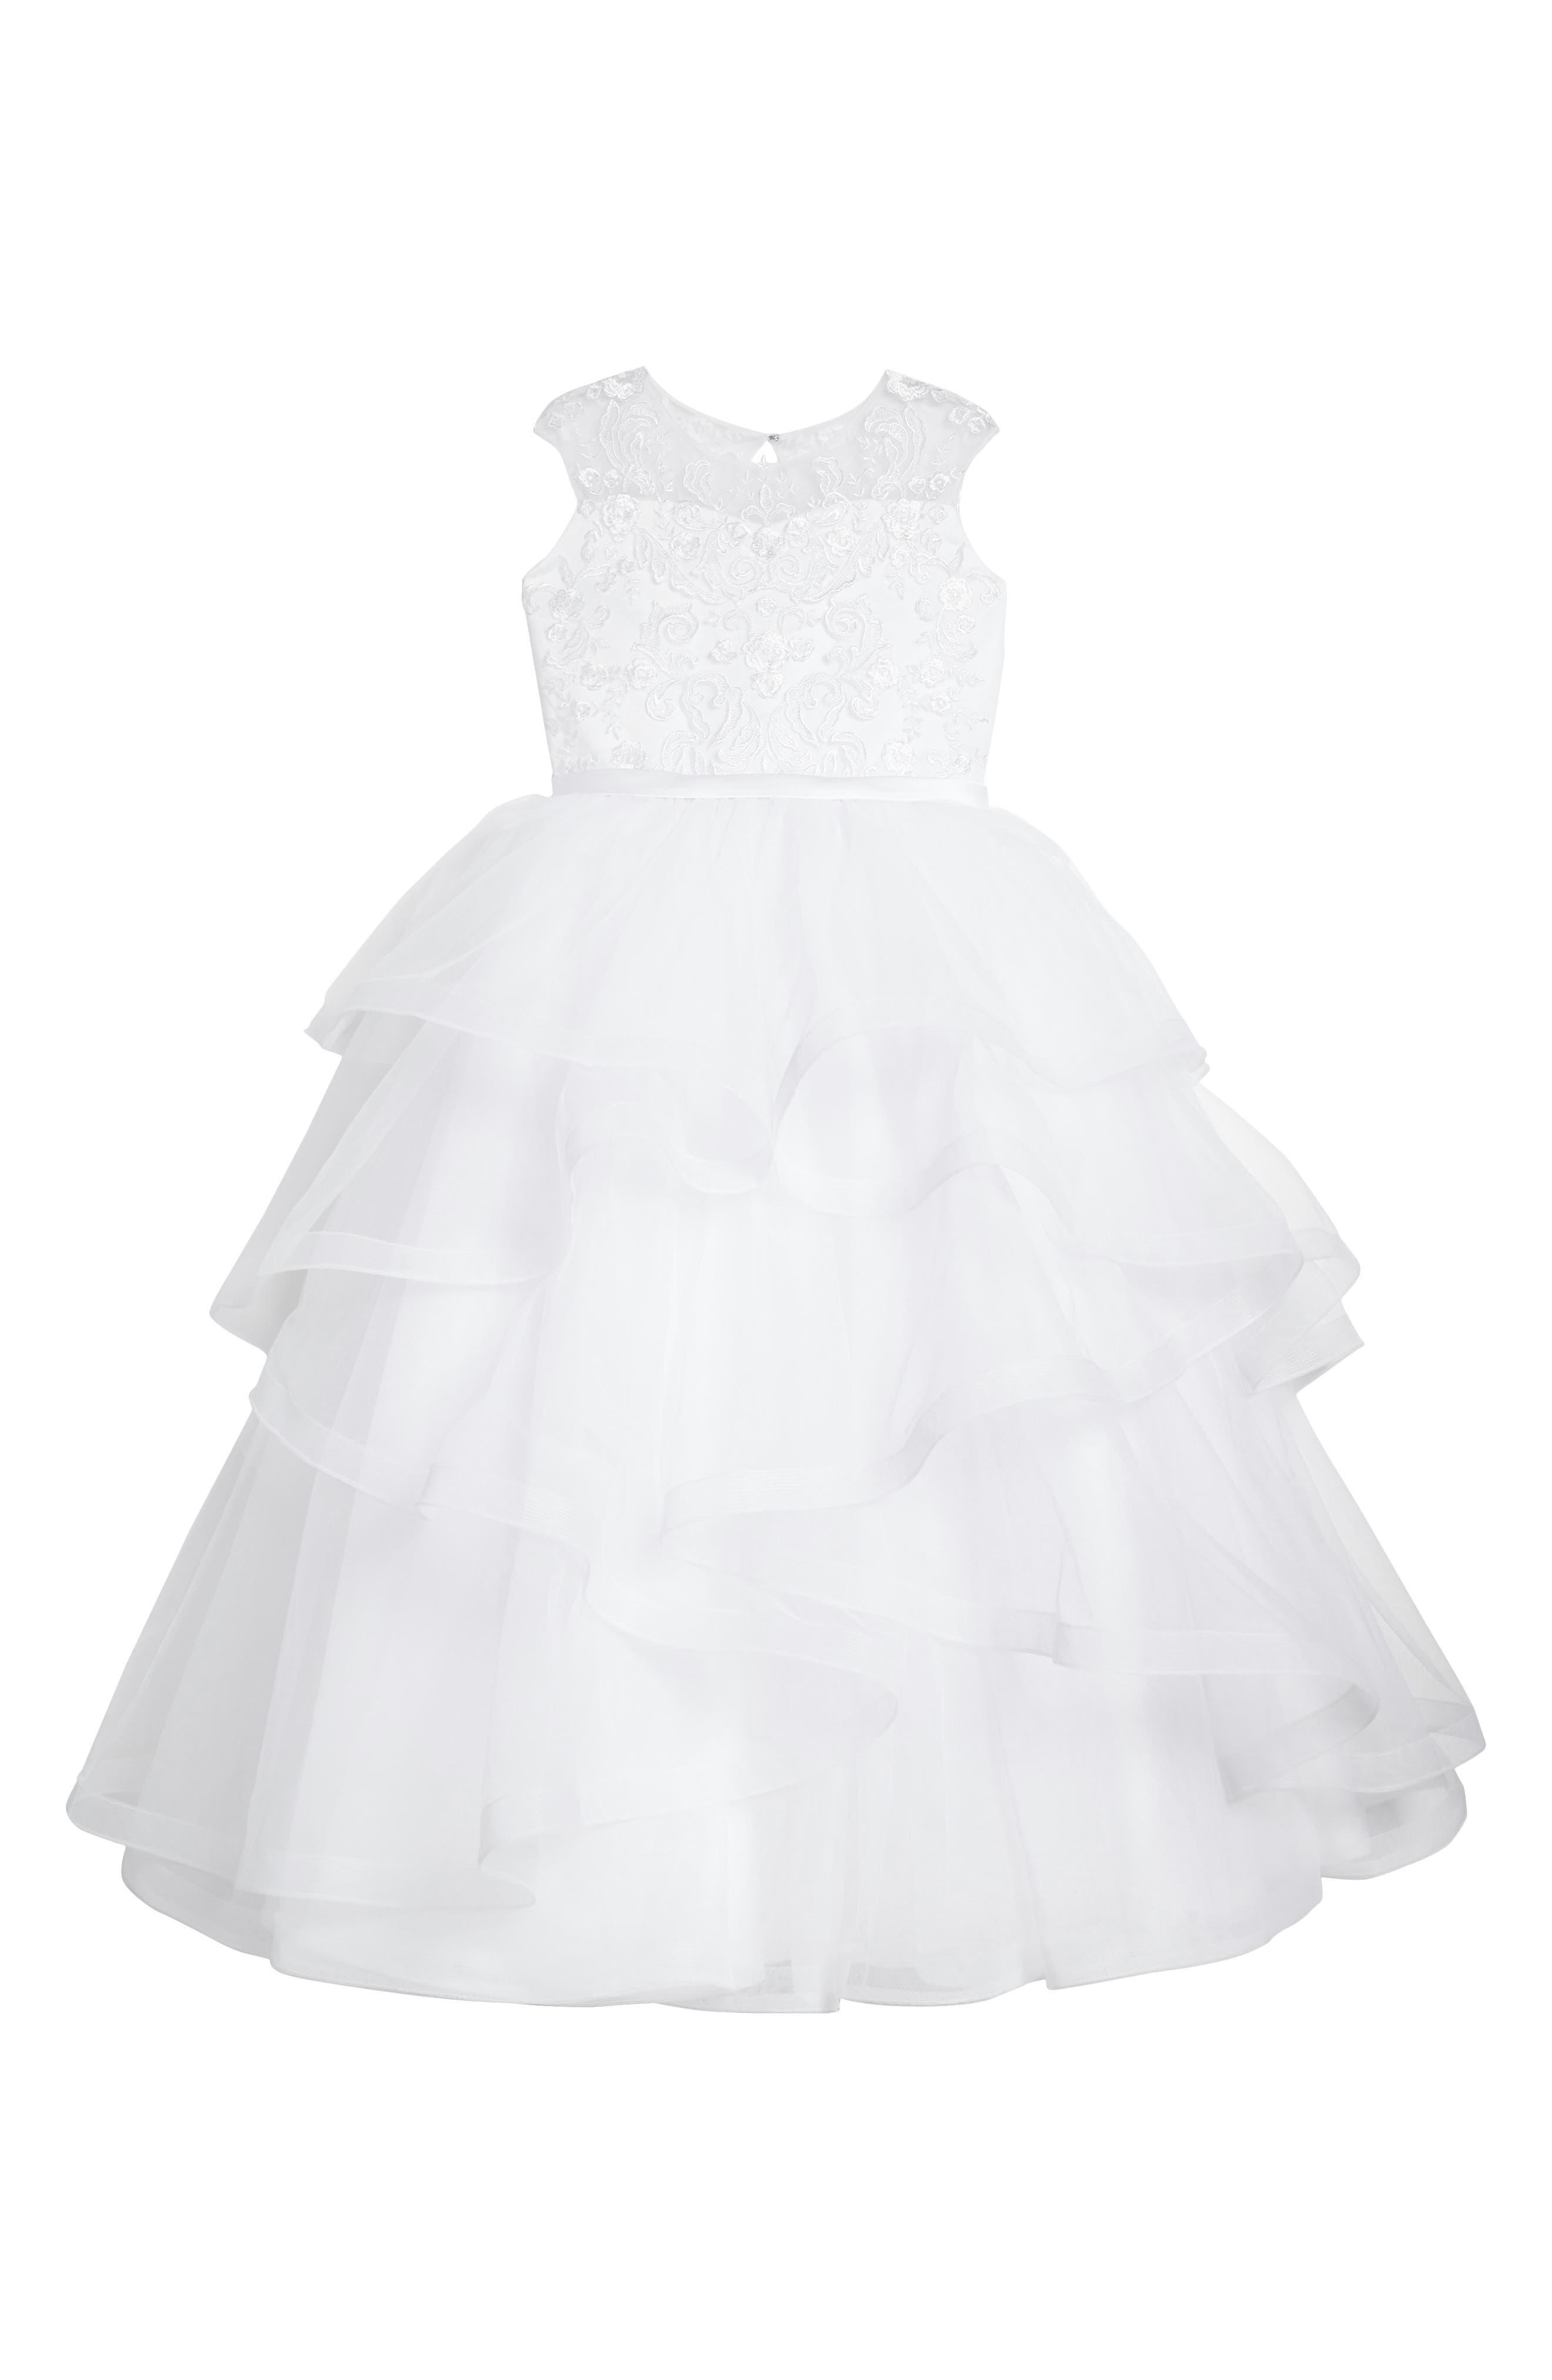 Main Image - Joan Calabrese for Mon Cheri Tiered First Communion Dress (Little Girls & Big Girls)